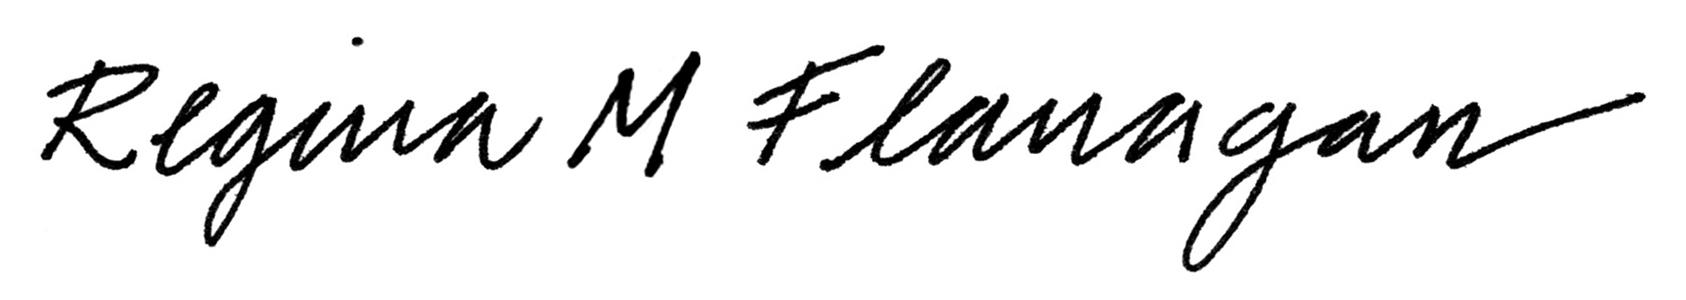 RF Signature_v2.jpg